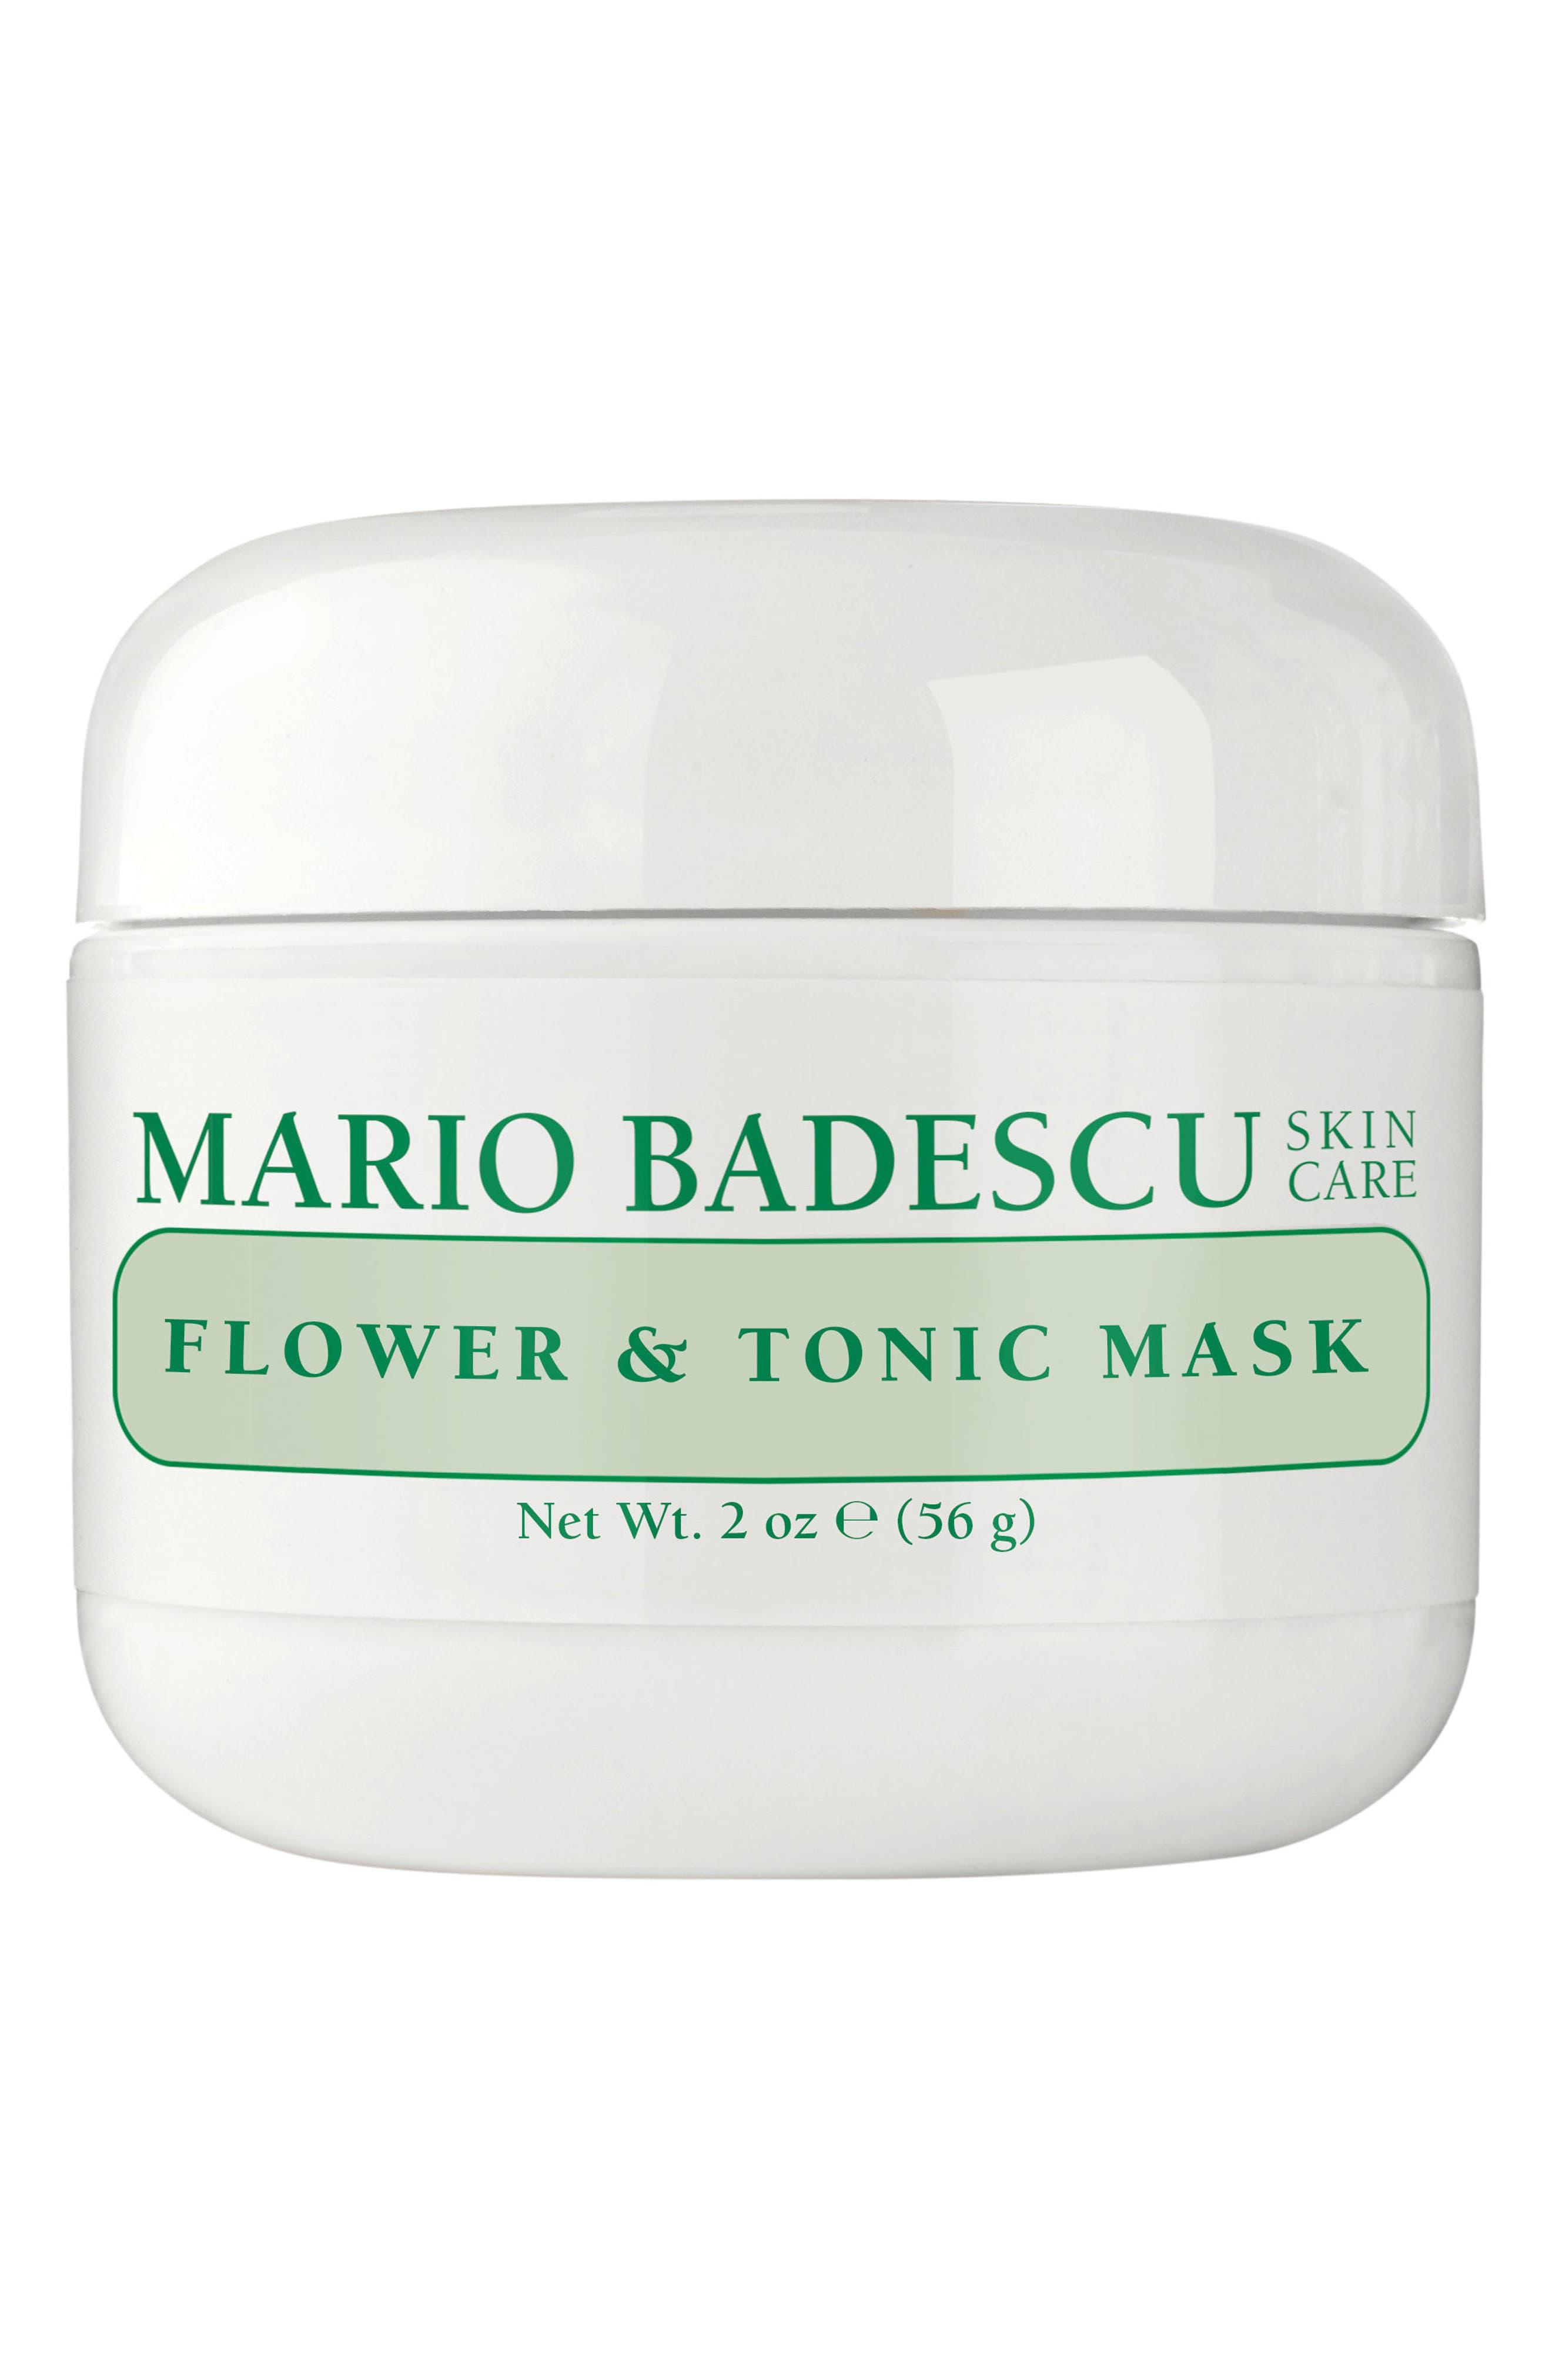 Flower & Tonic Mask,                             Main thumbnail 1, color,                             None